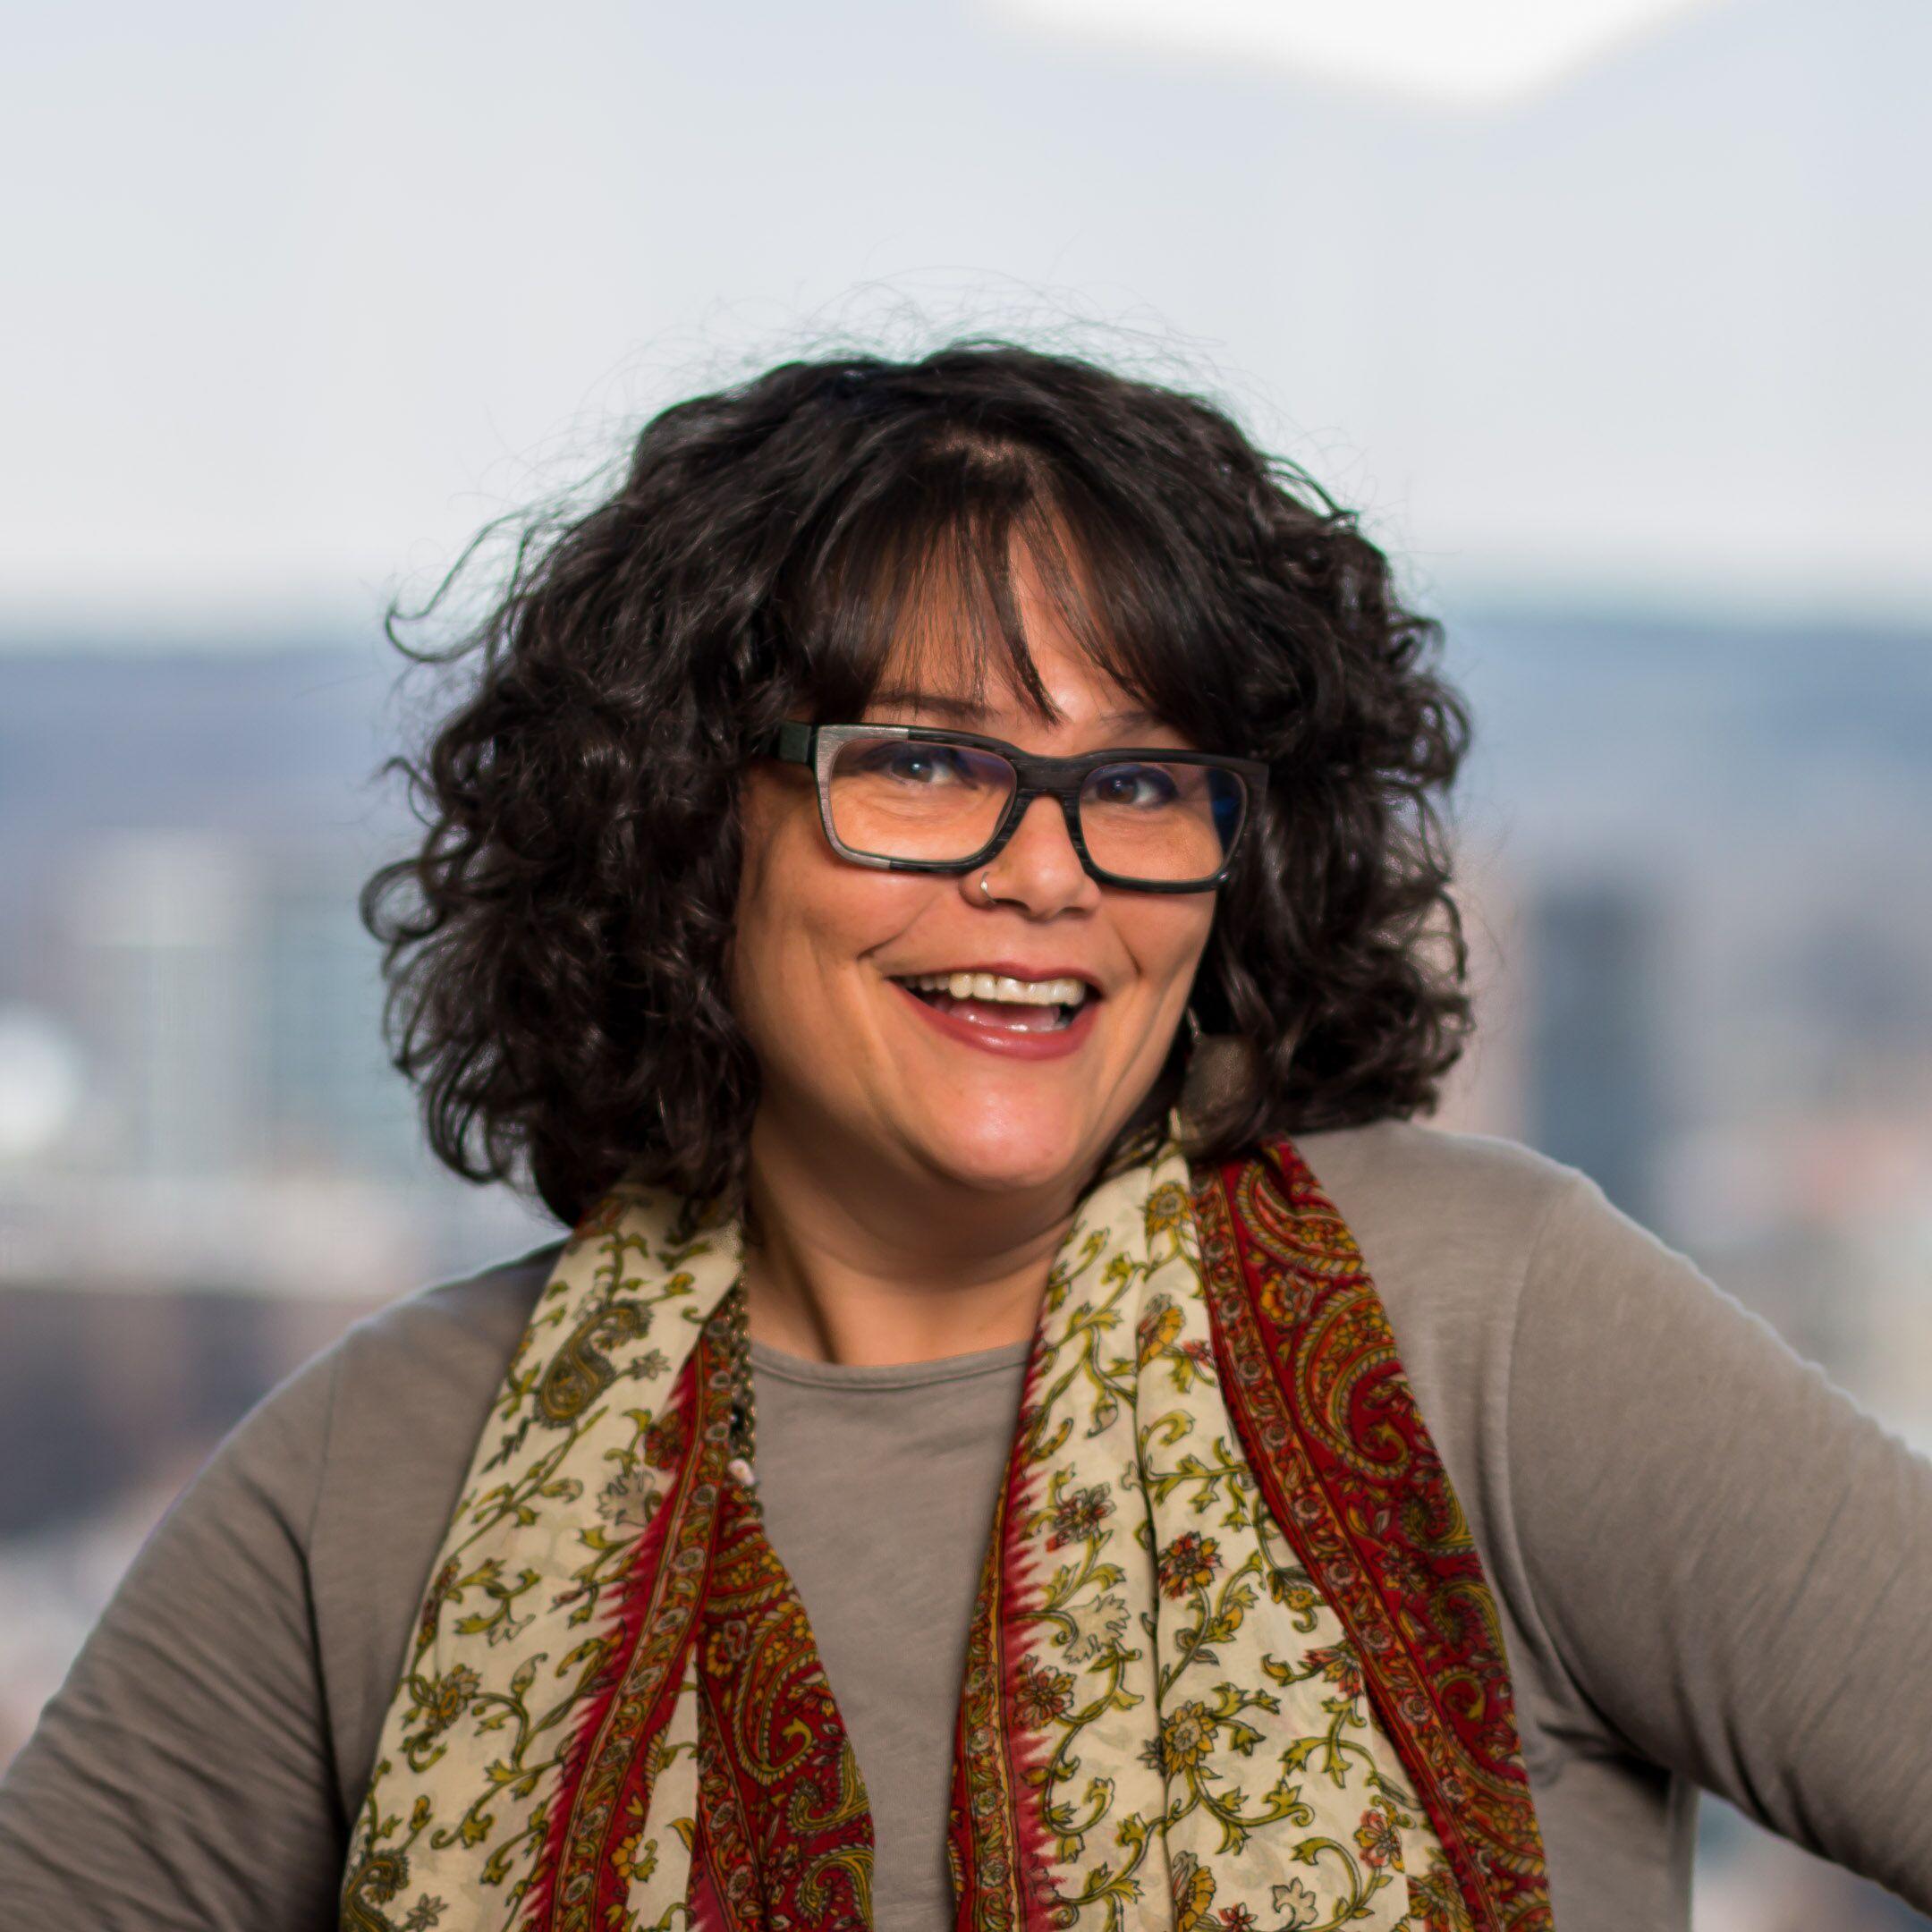 Maria Lavandier Bouffard, CEM, CBCP